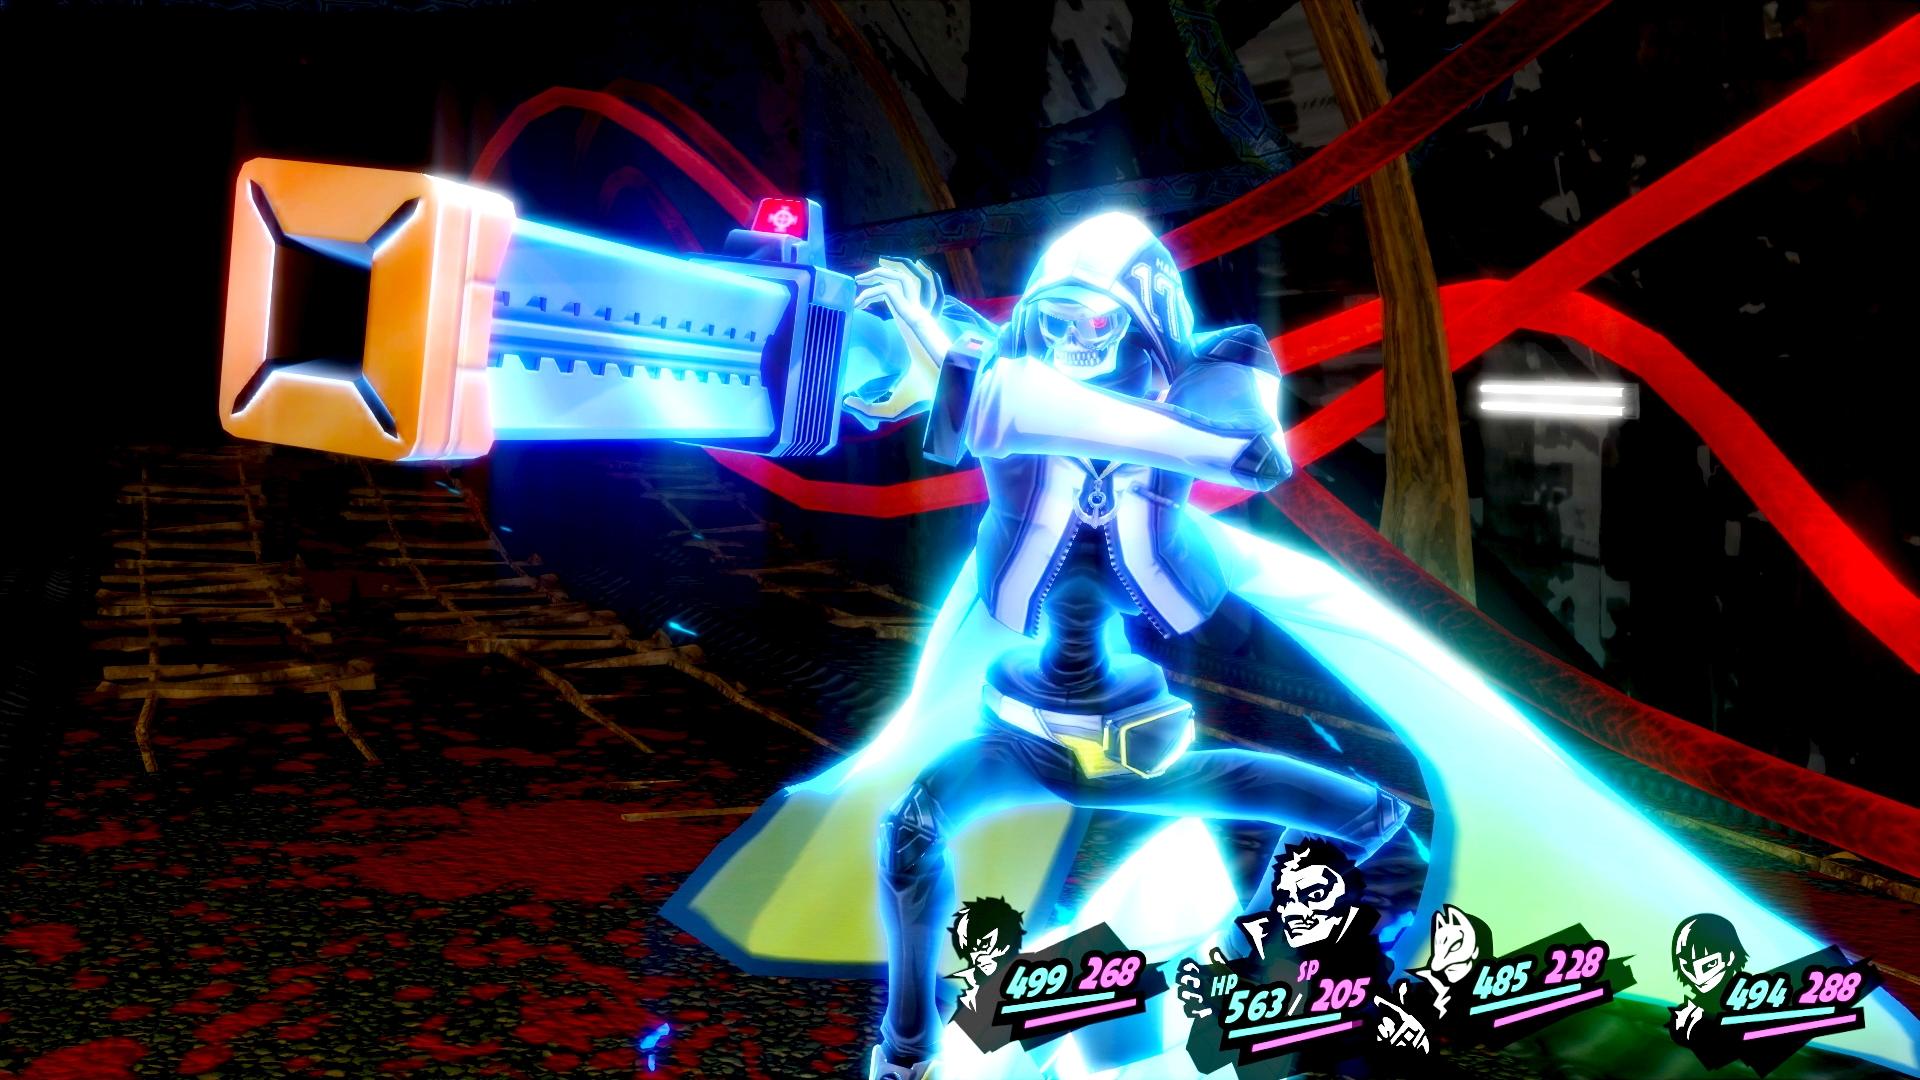 Persona 5 Royal Screenshots show new Personas, activities